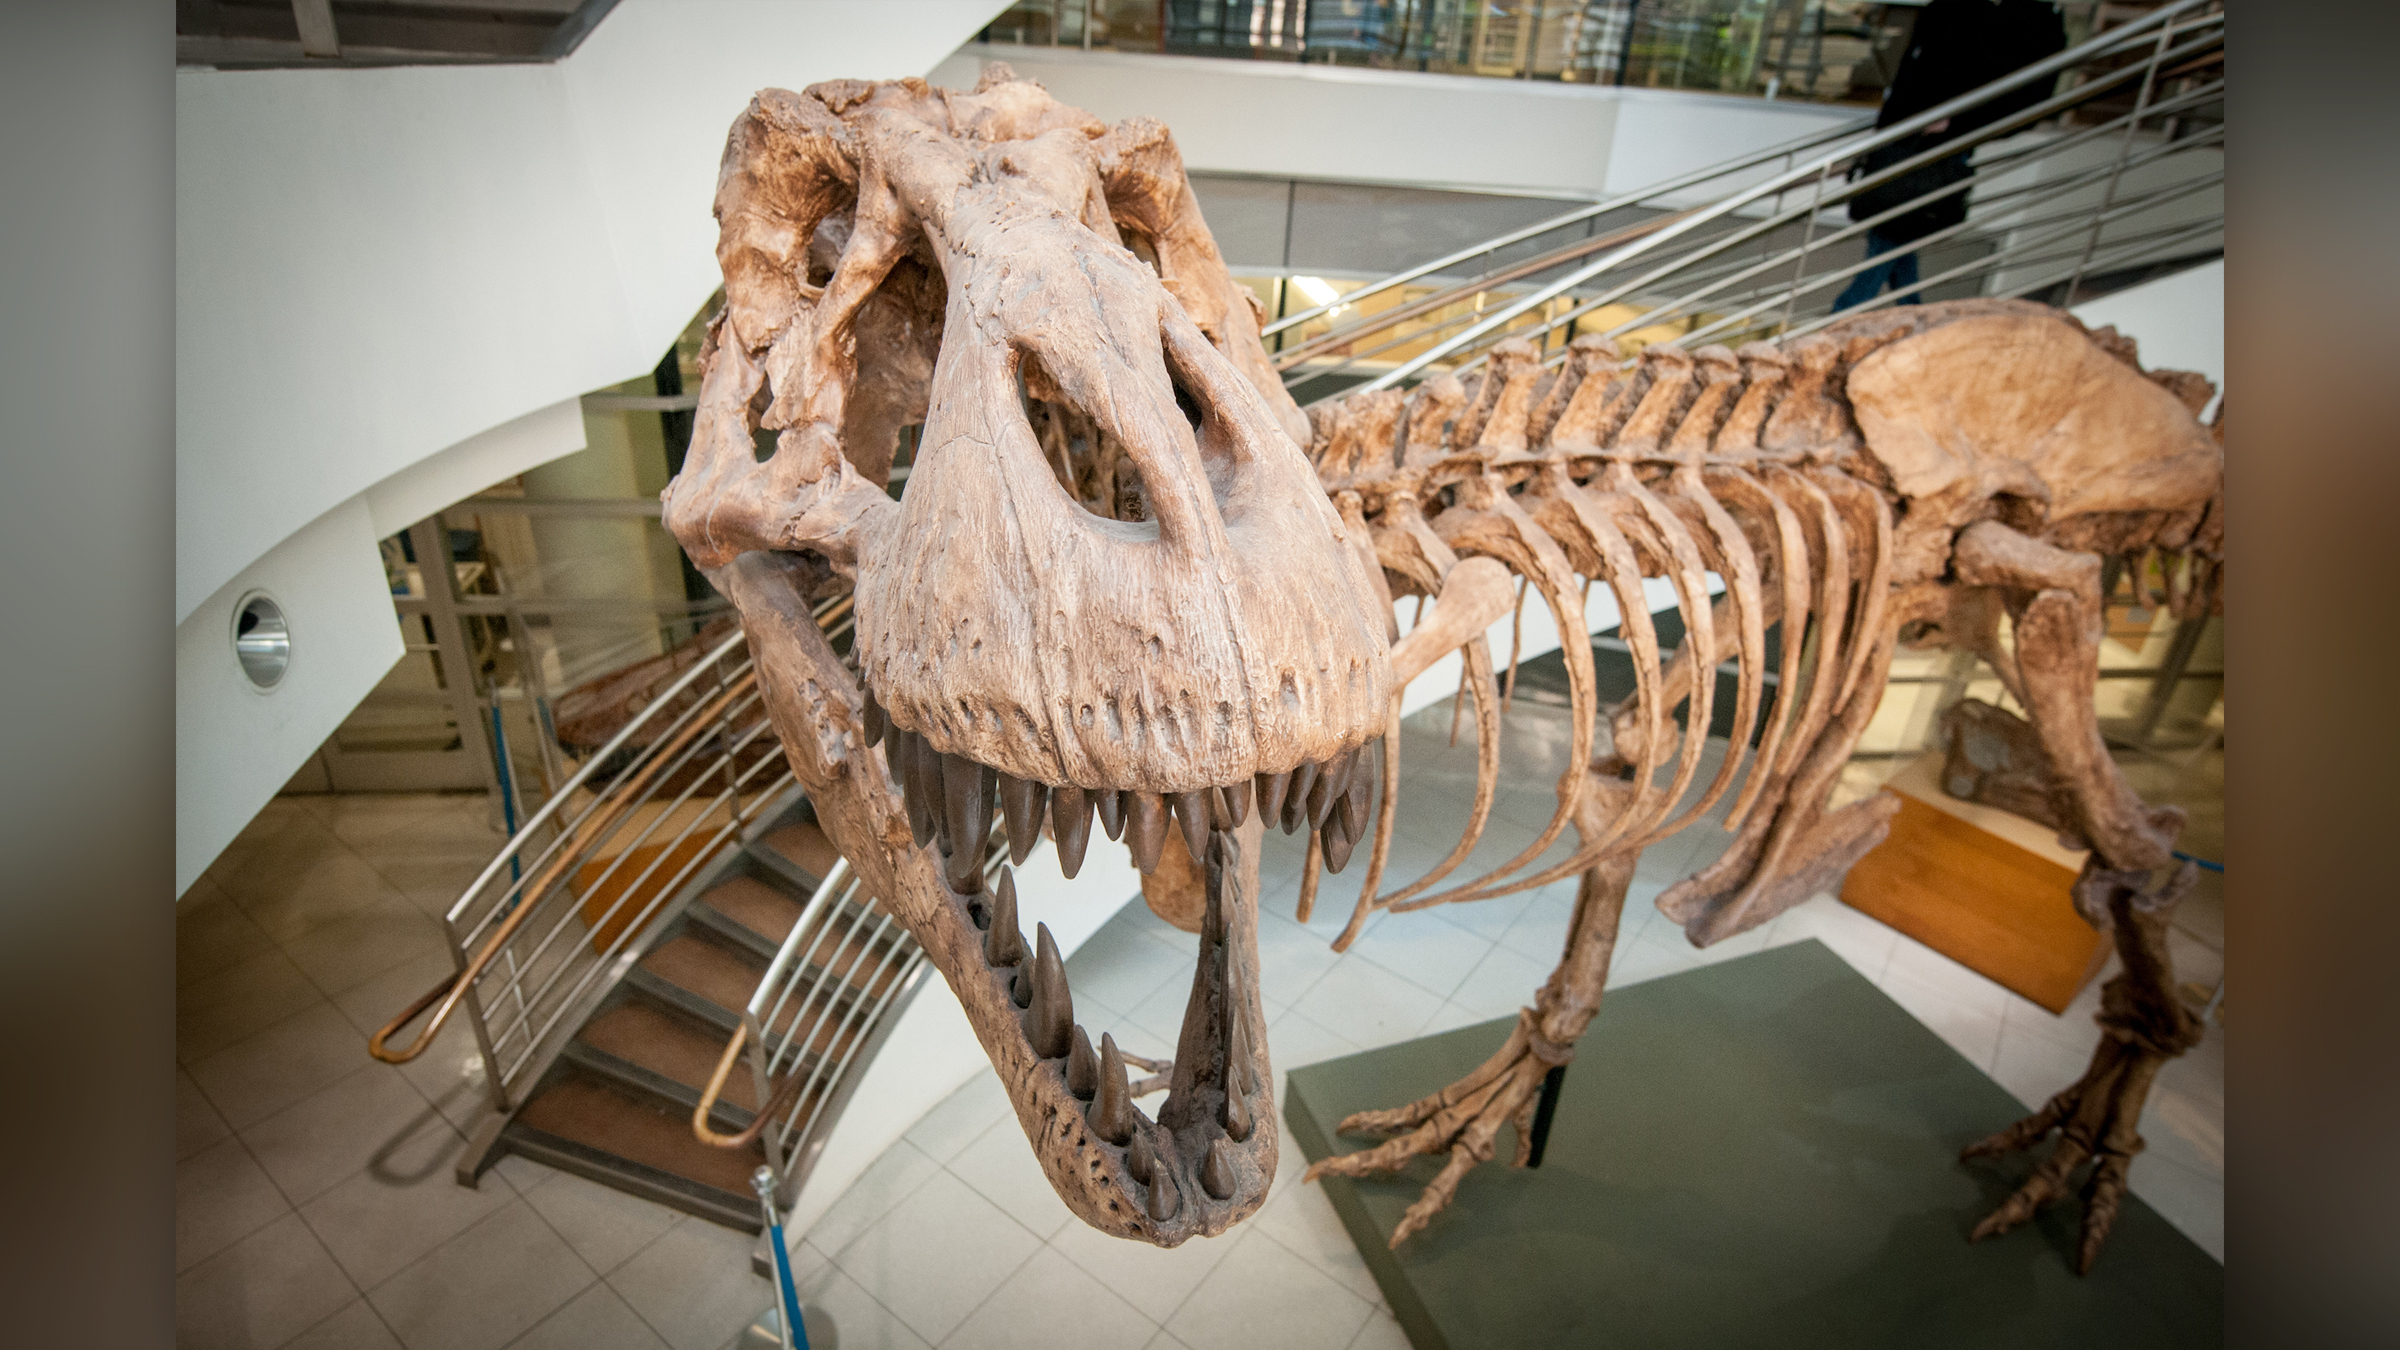 As many as 2.5 billion Tyrannosaurus rexes as soon as stalked Earth PZCeqxYRAxoZe8F9YTW9iE